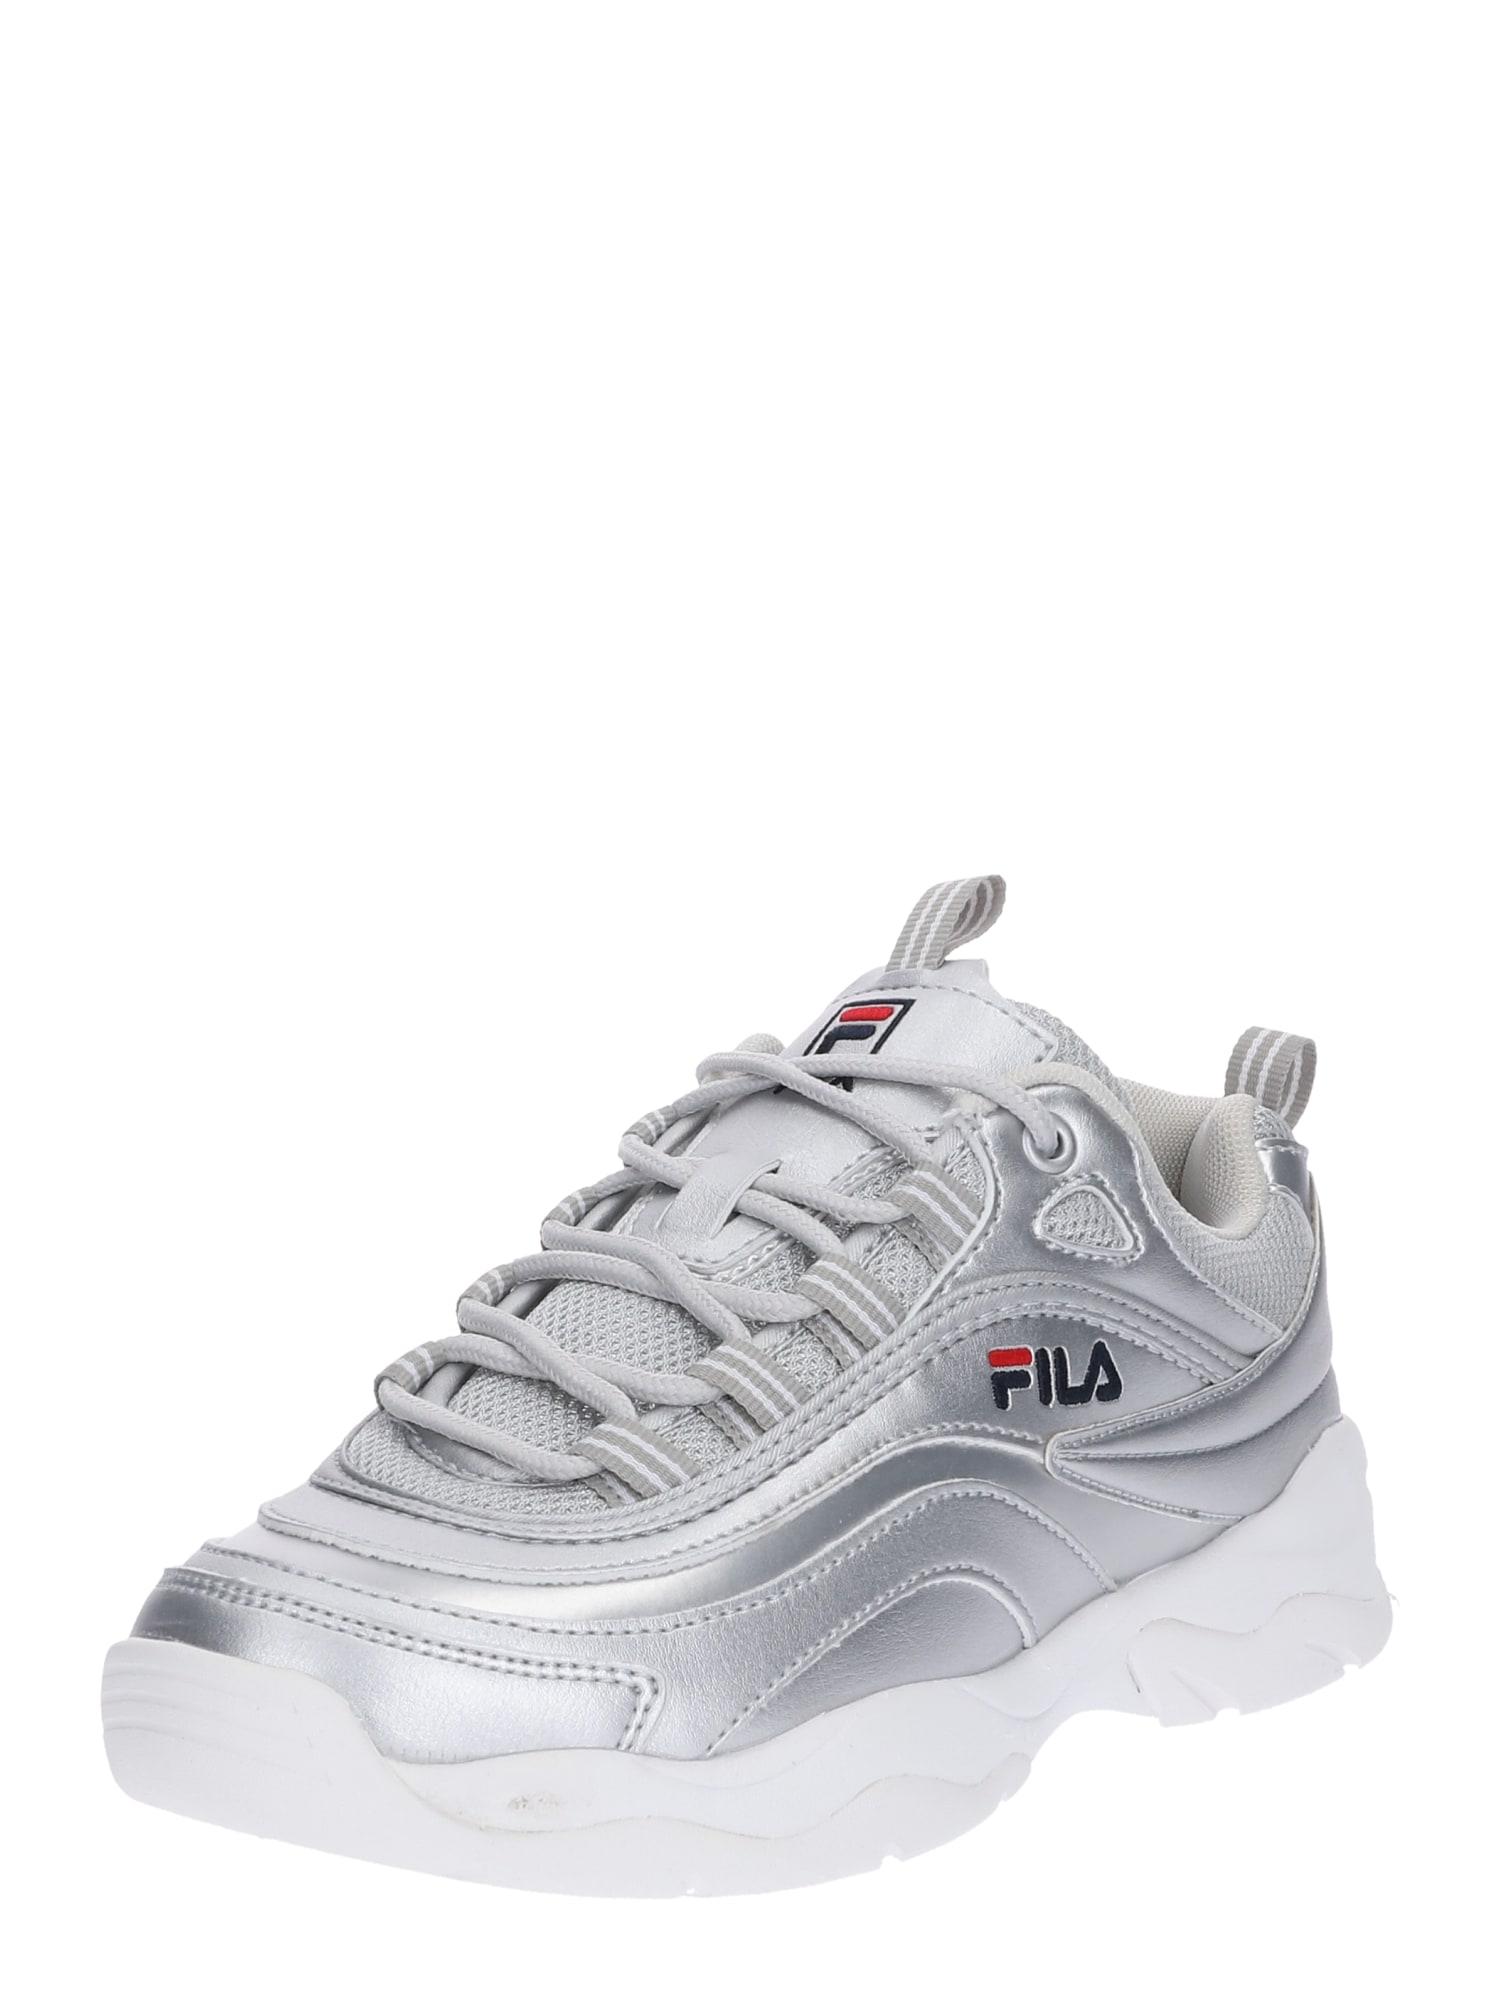 Tenisky Ray F stříbrná bílá FILA